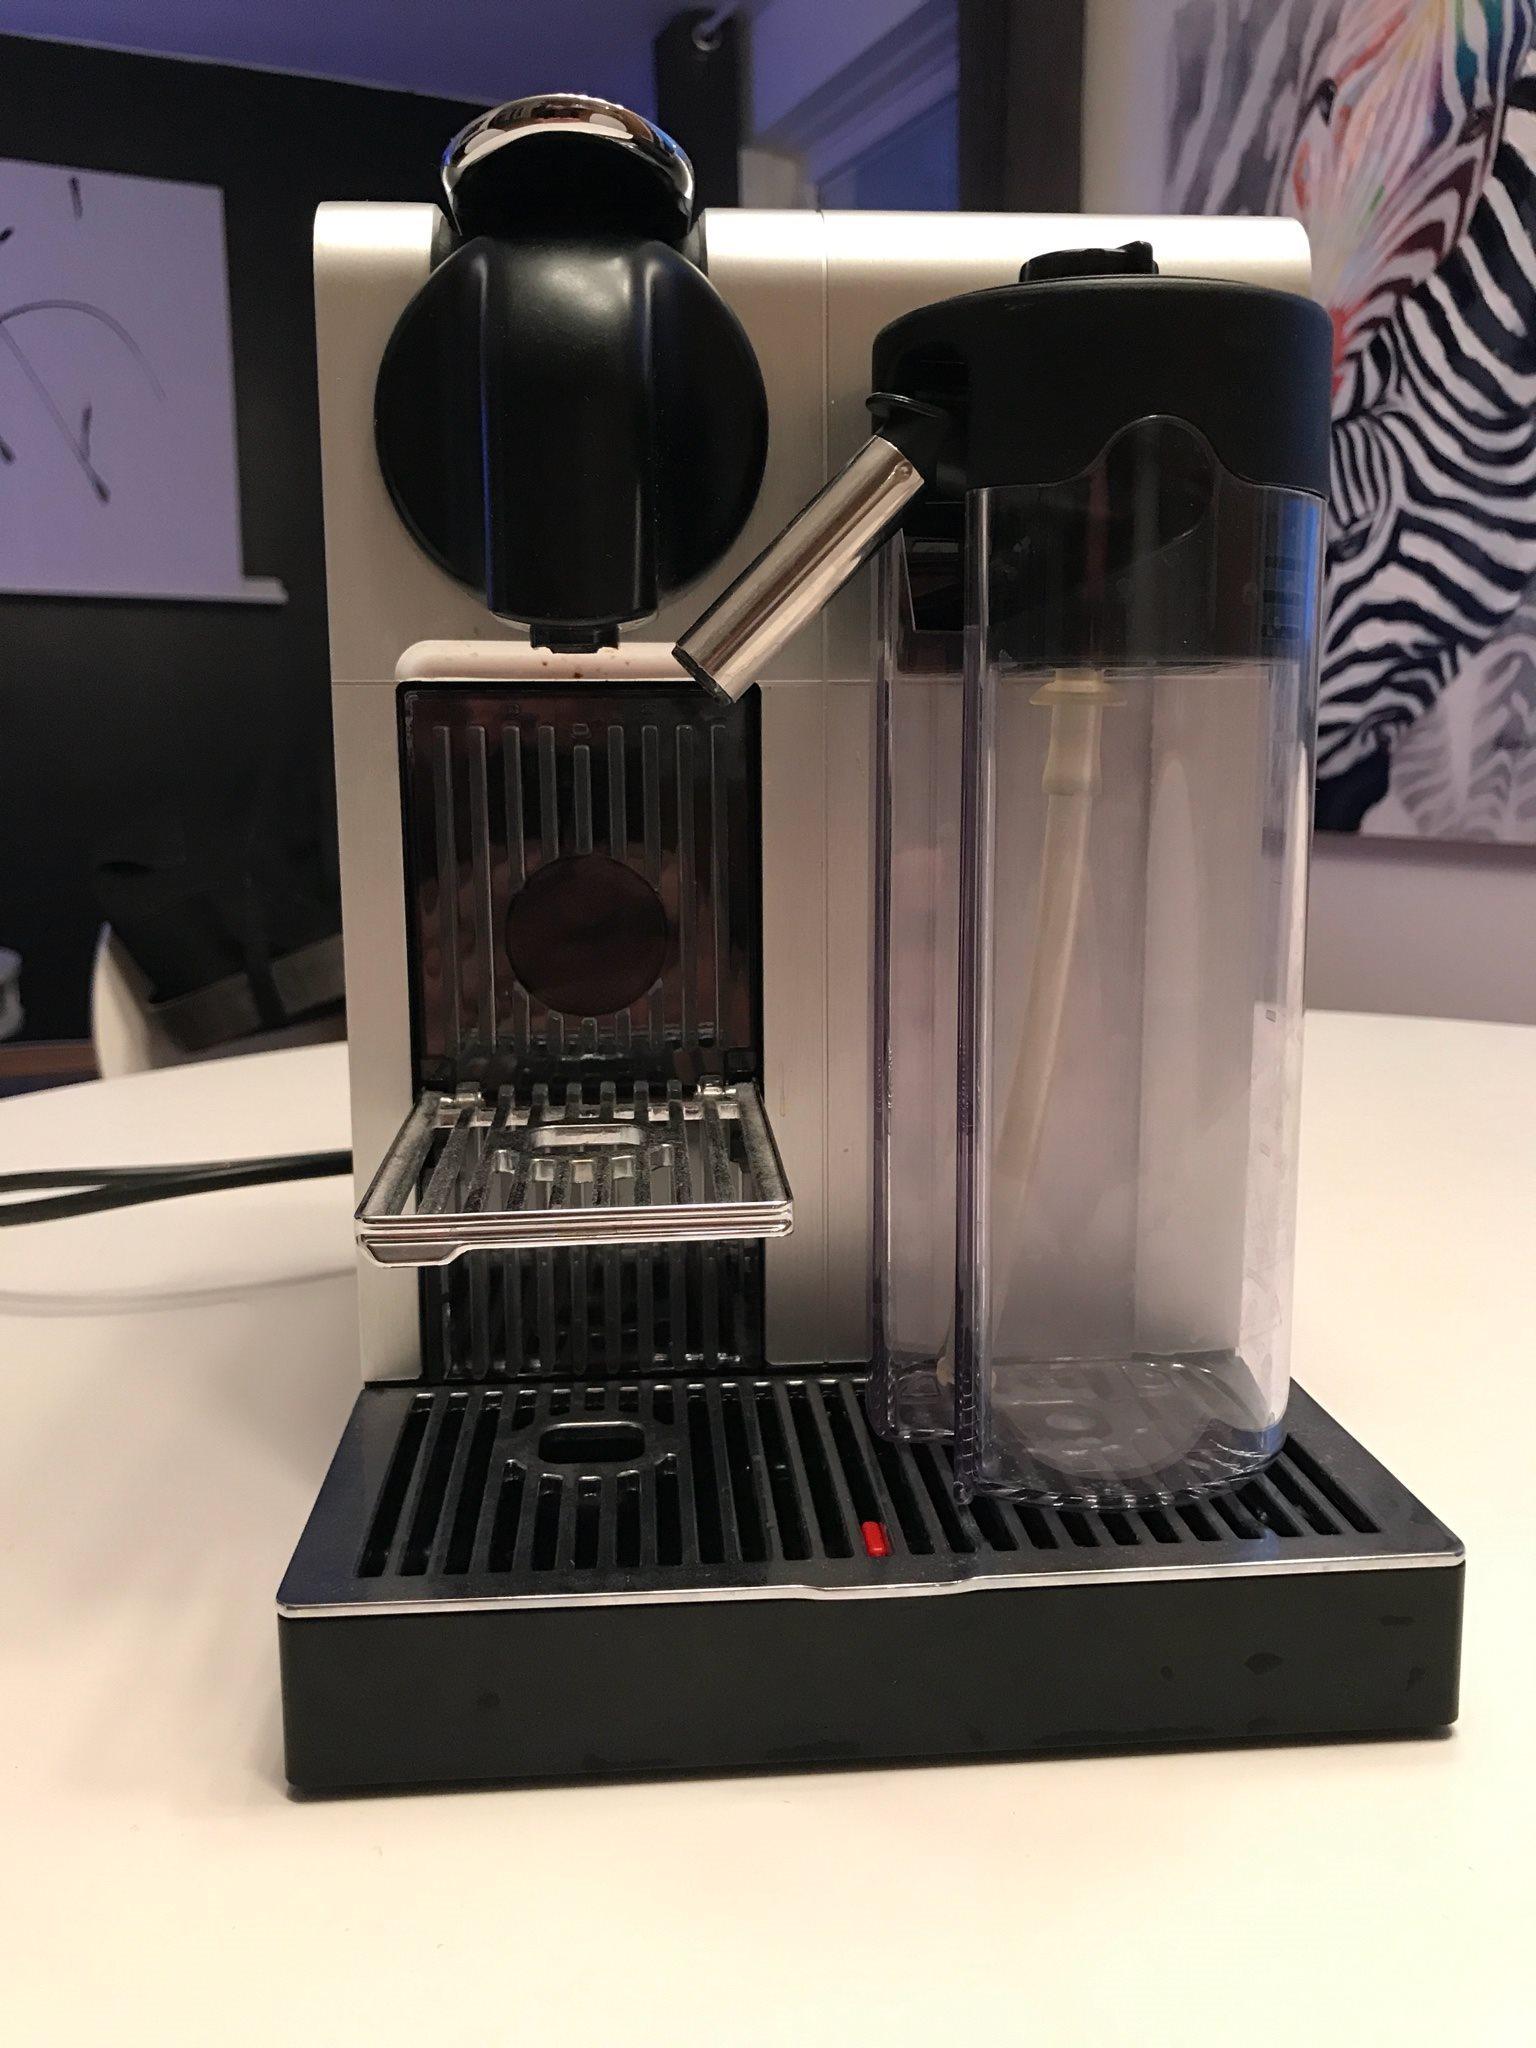 nespresso lattissima pro f456 - Nespresso Lattissima Pro